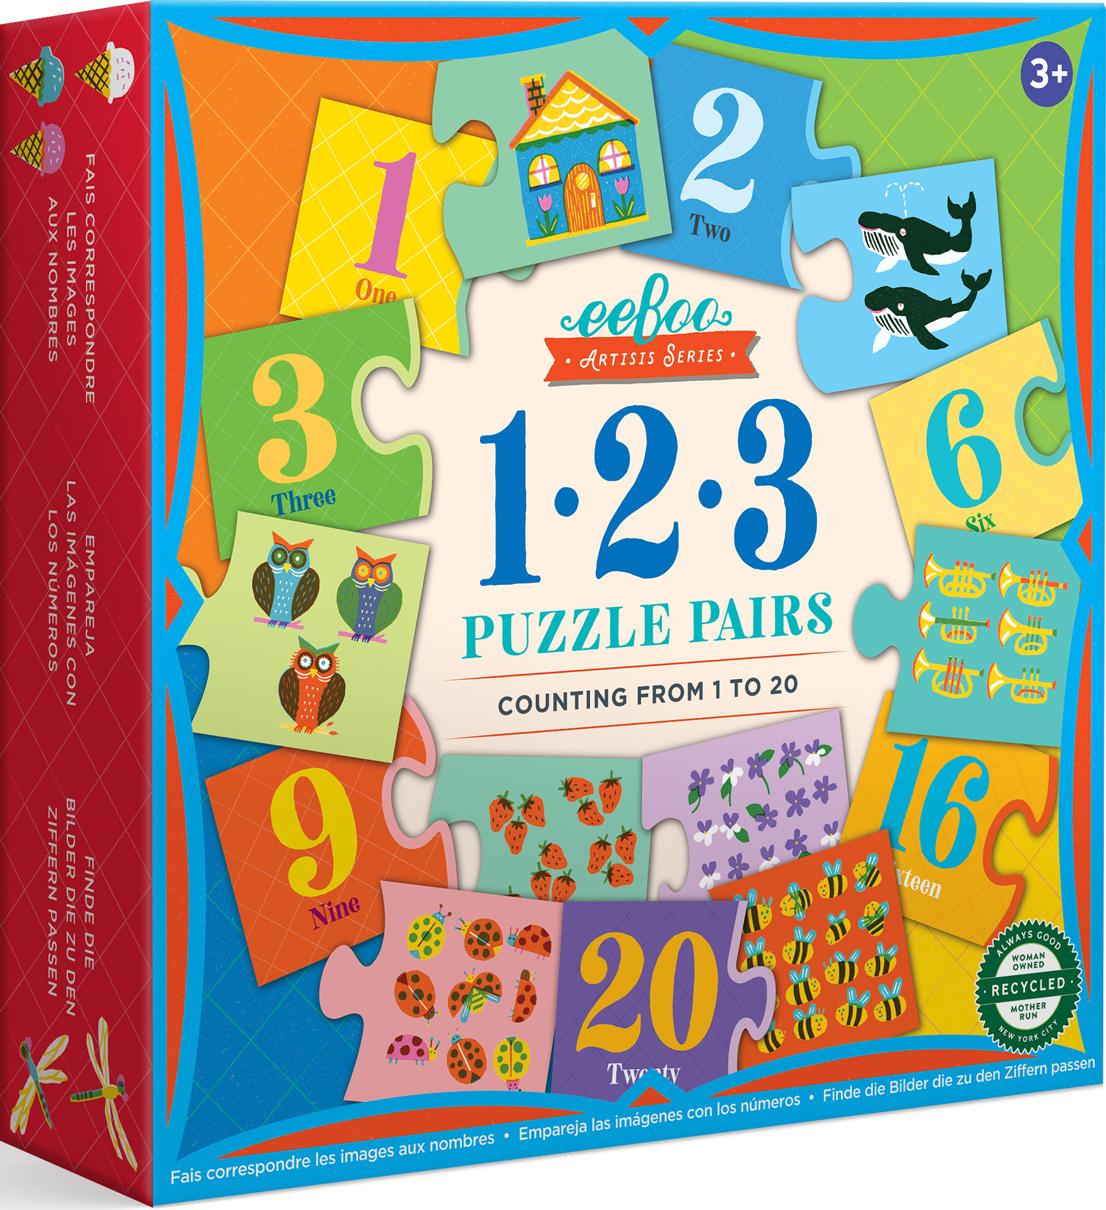 Artist's Puzzle Pair 1-2-3 Educational Jigsaw Puzzle